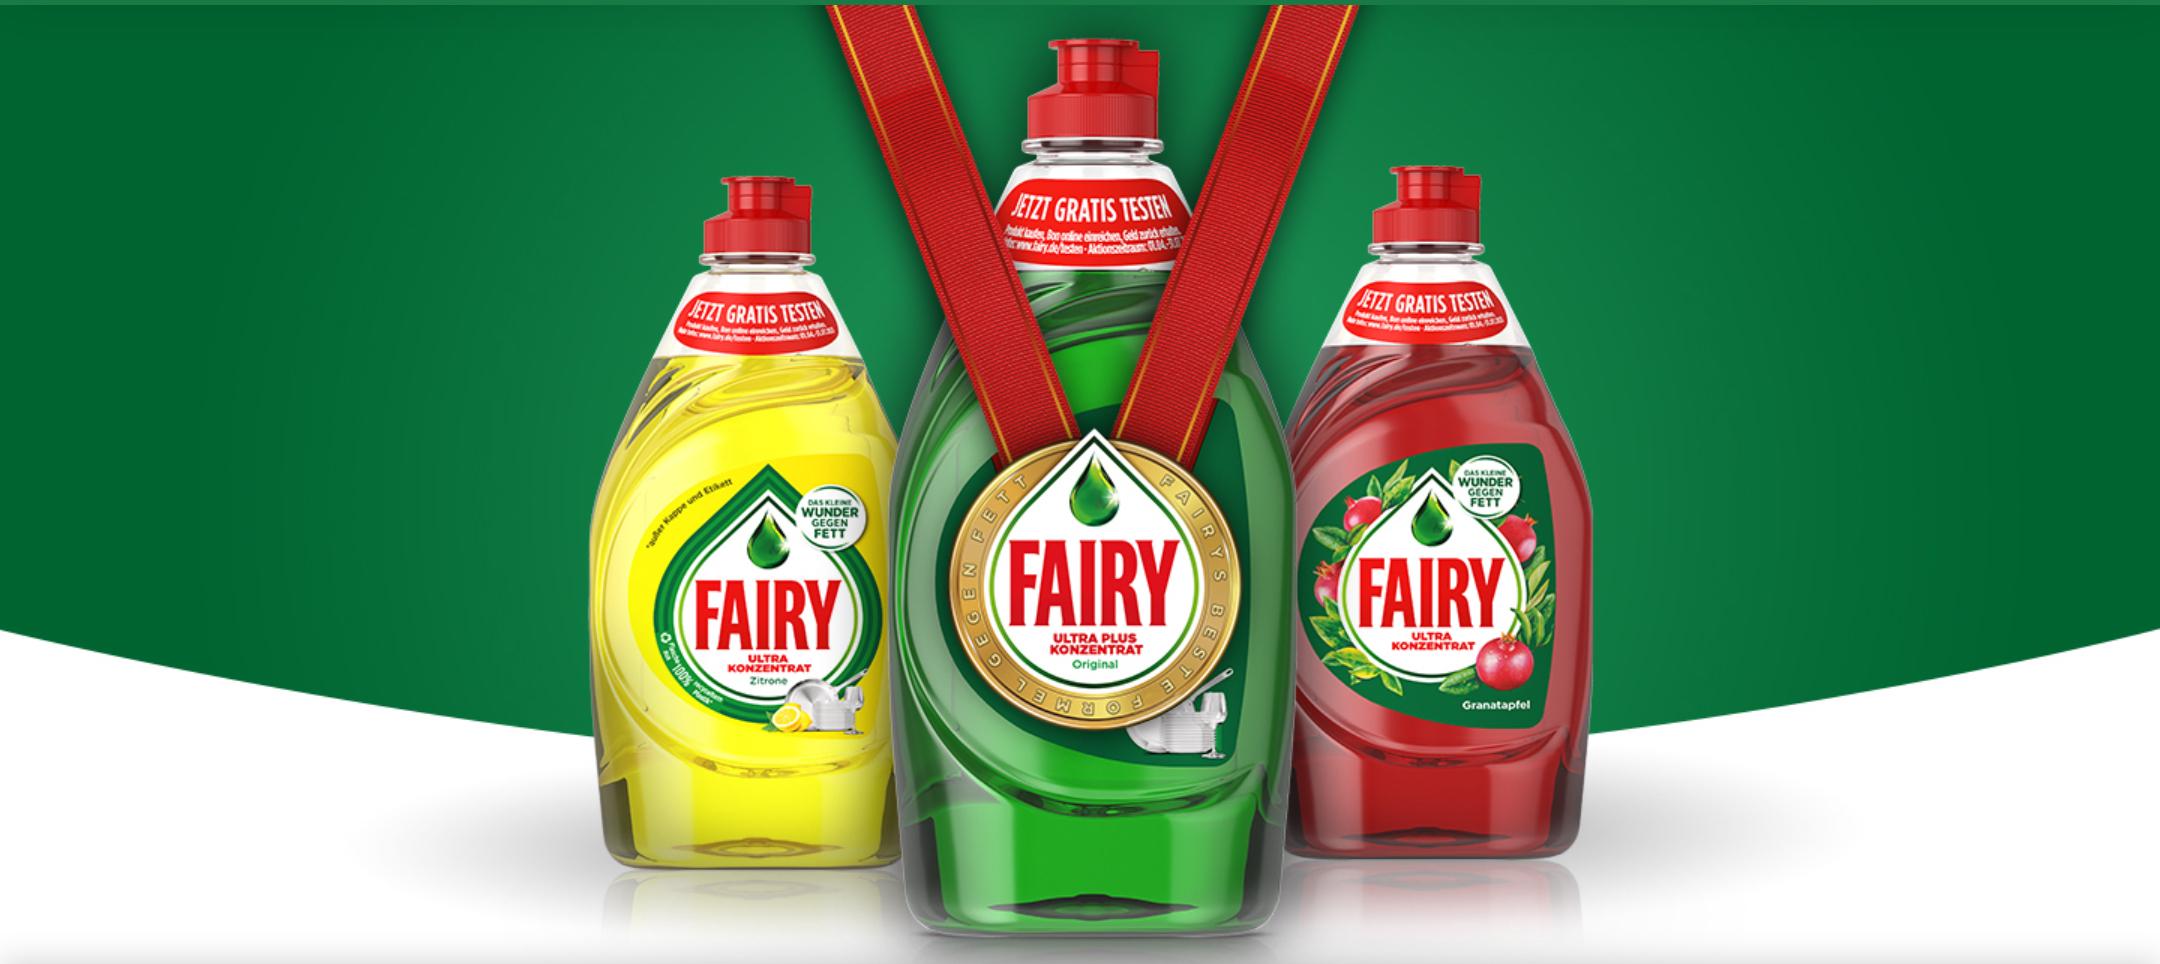 Fairy gratis testen